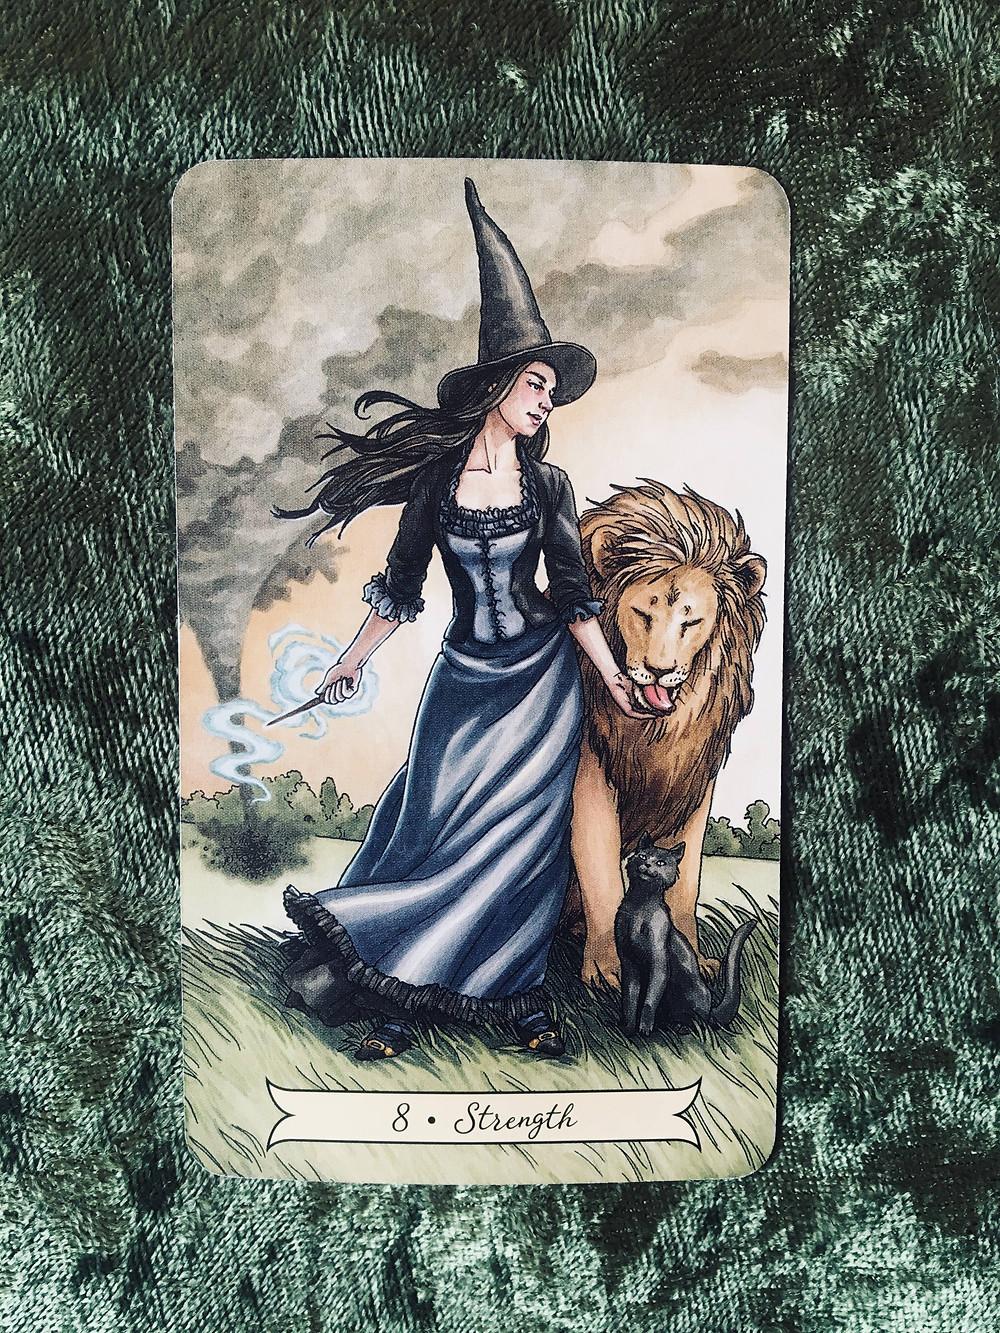 Tarot card meanings: Strength